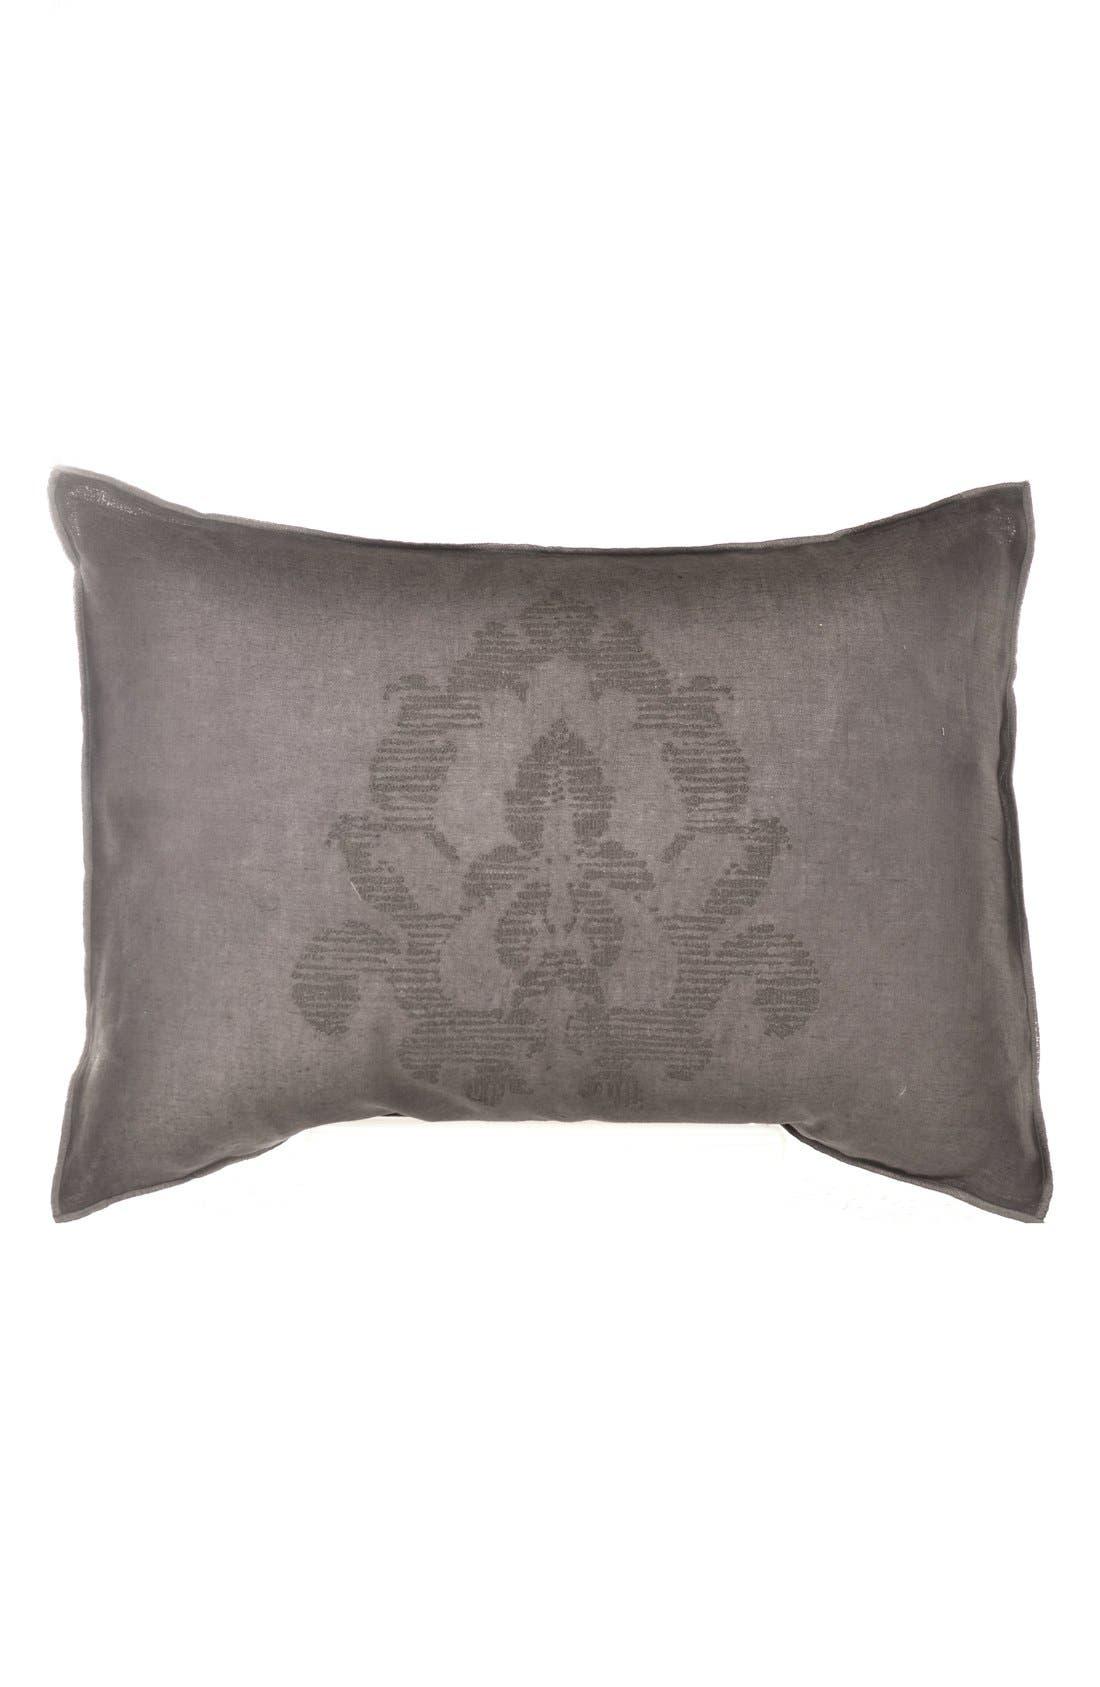 Alternate Image 1 Selected - Vera Wang 'Damask' Pillow